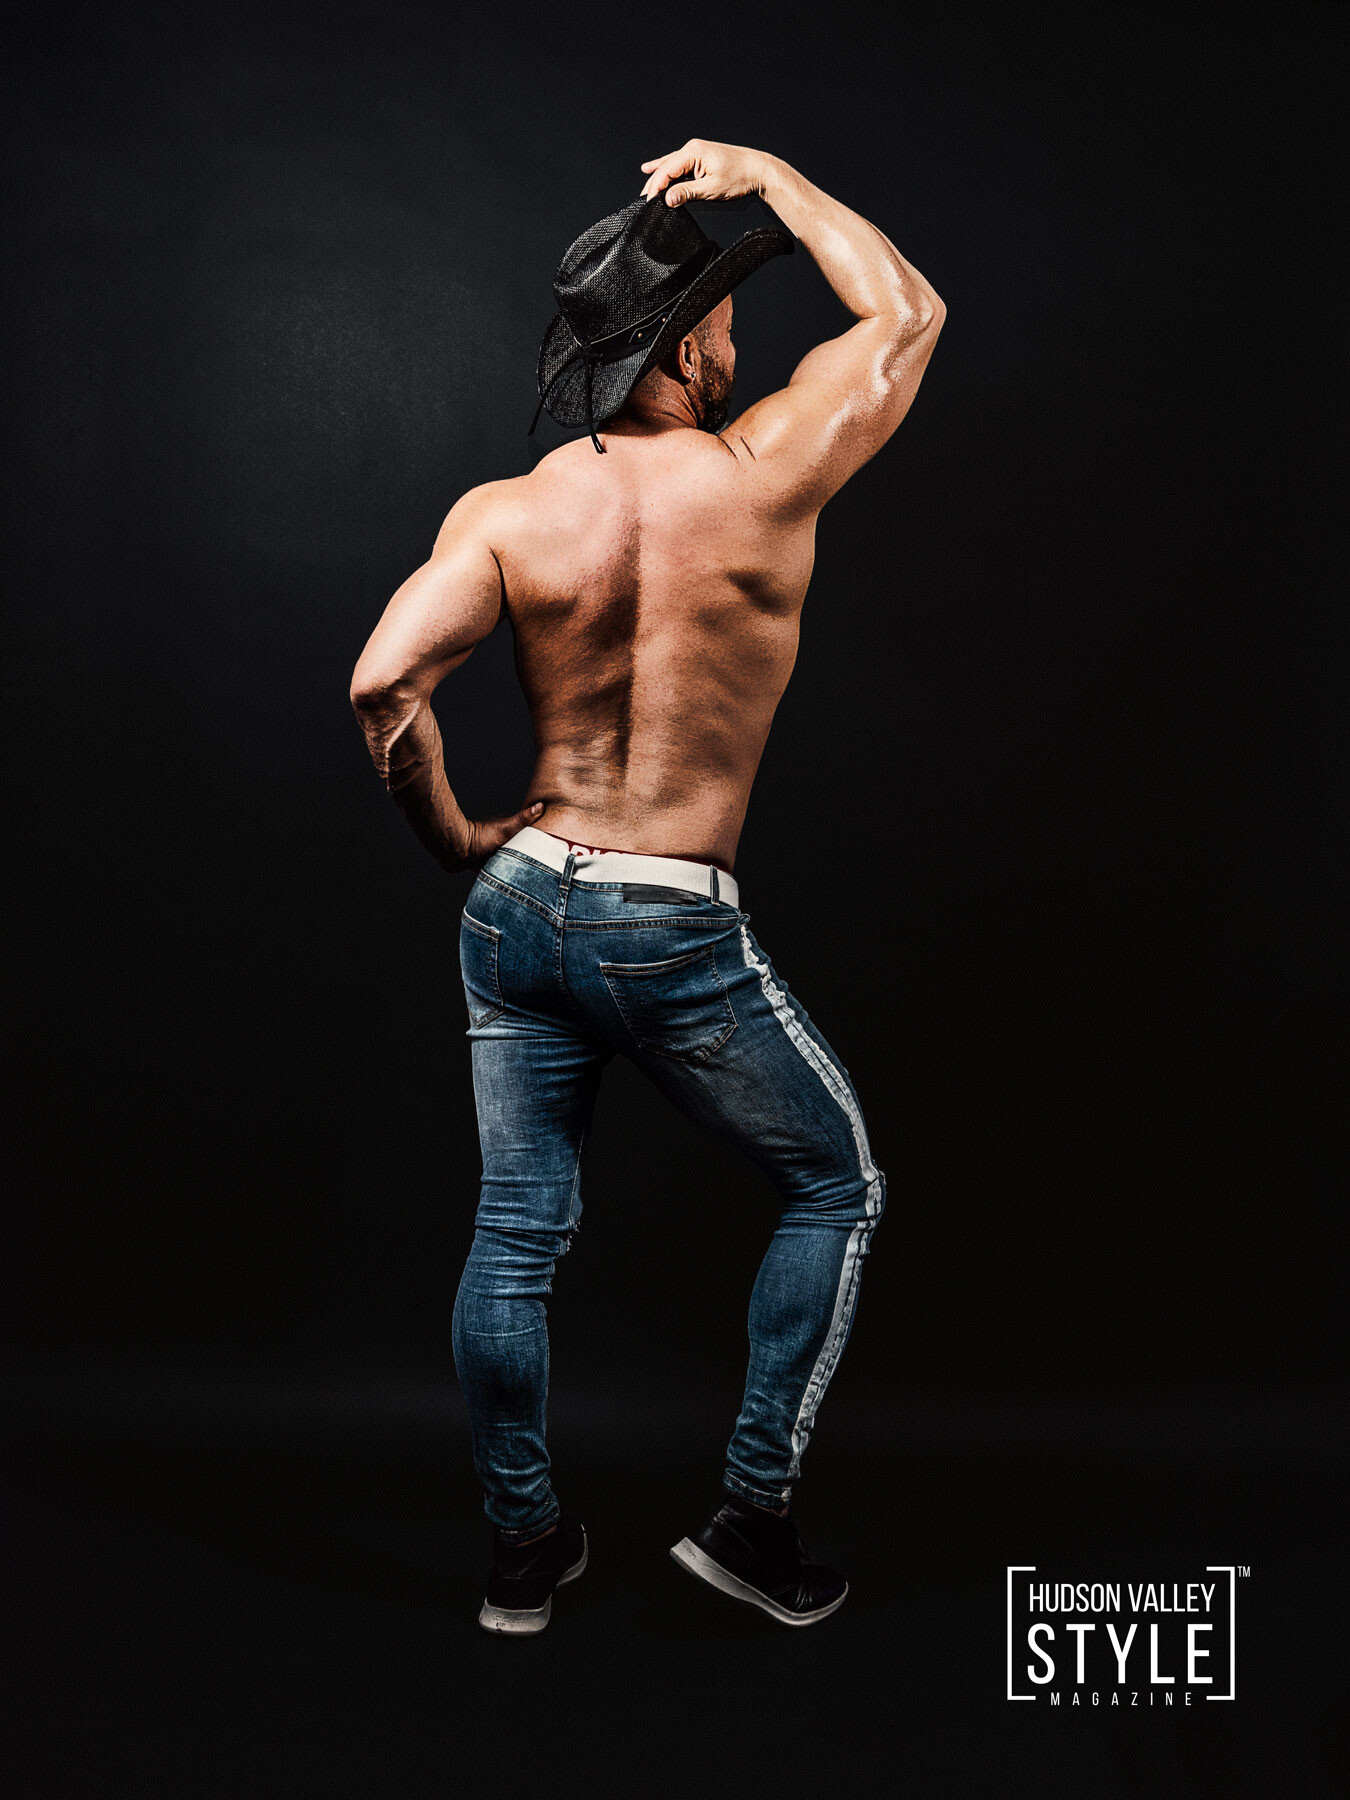 Bodybuilding Diet Tips by Coach Maxwell Alexander, MA, BFA, Certified Elite Fitness Trainer, Certified Bodybuilding Coach, Certified Sports Nutritionist – Fitness and Bodybuilding Photography by Duncan Avenue Studios, New York